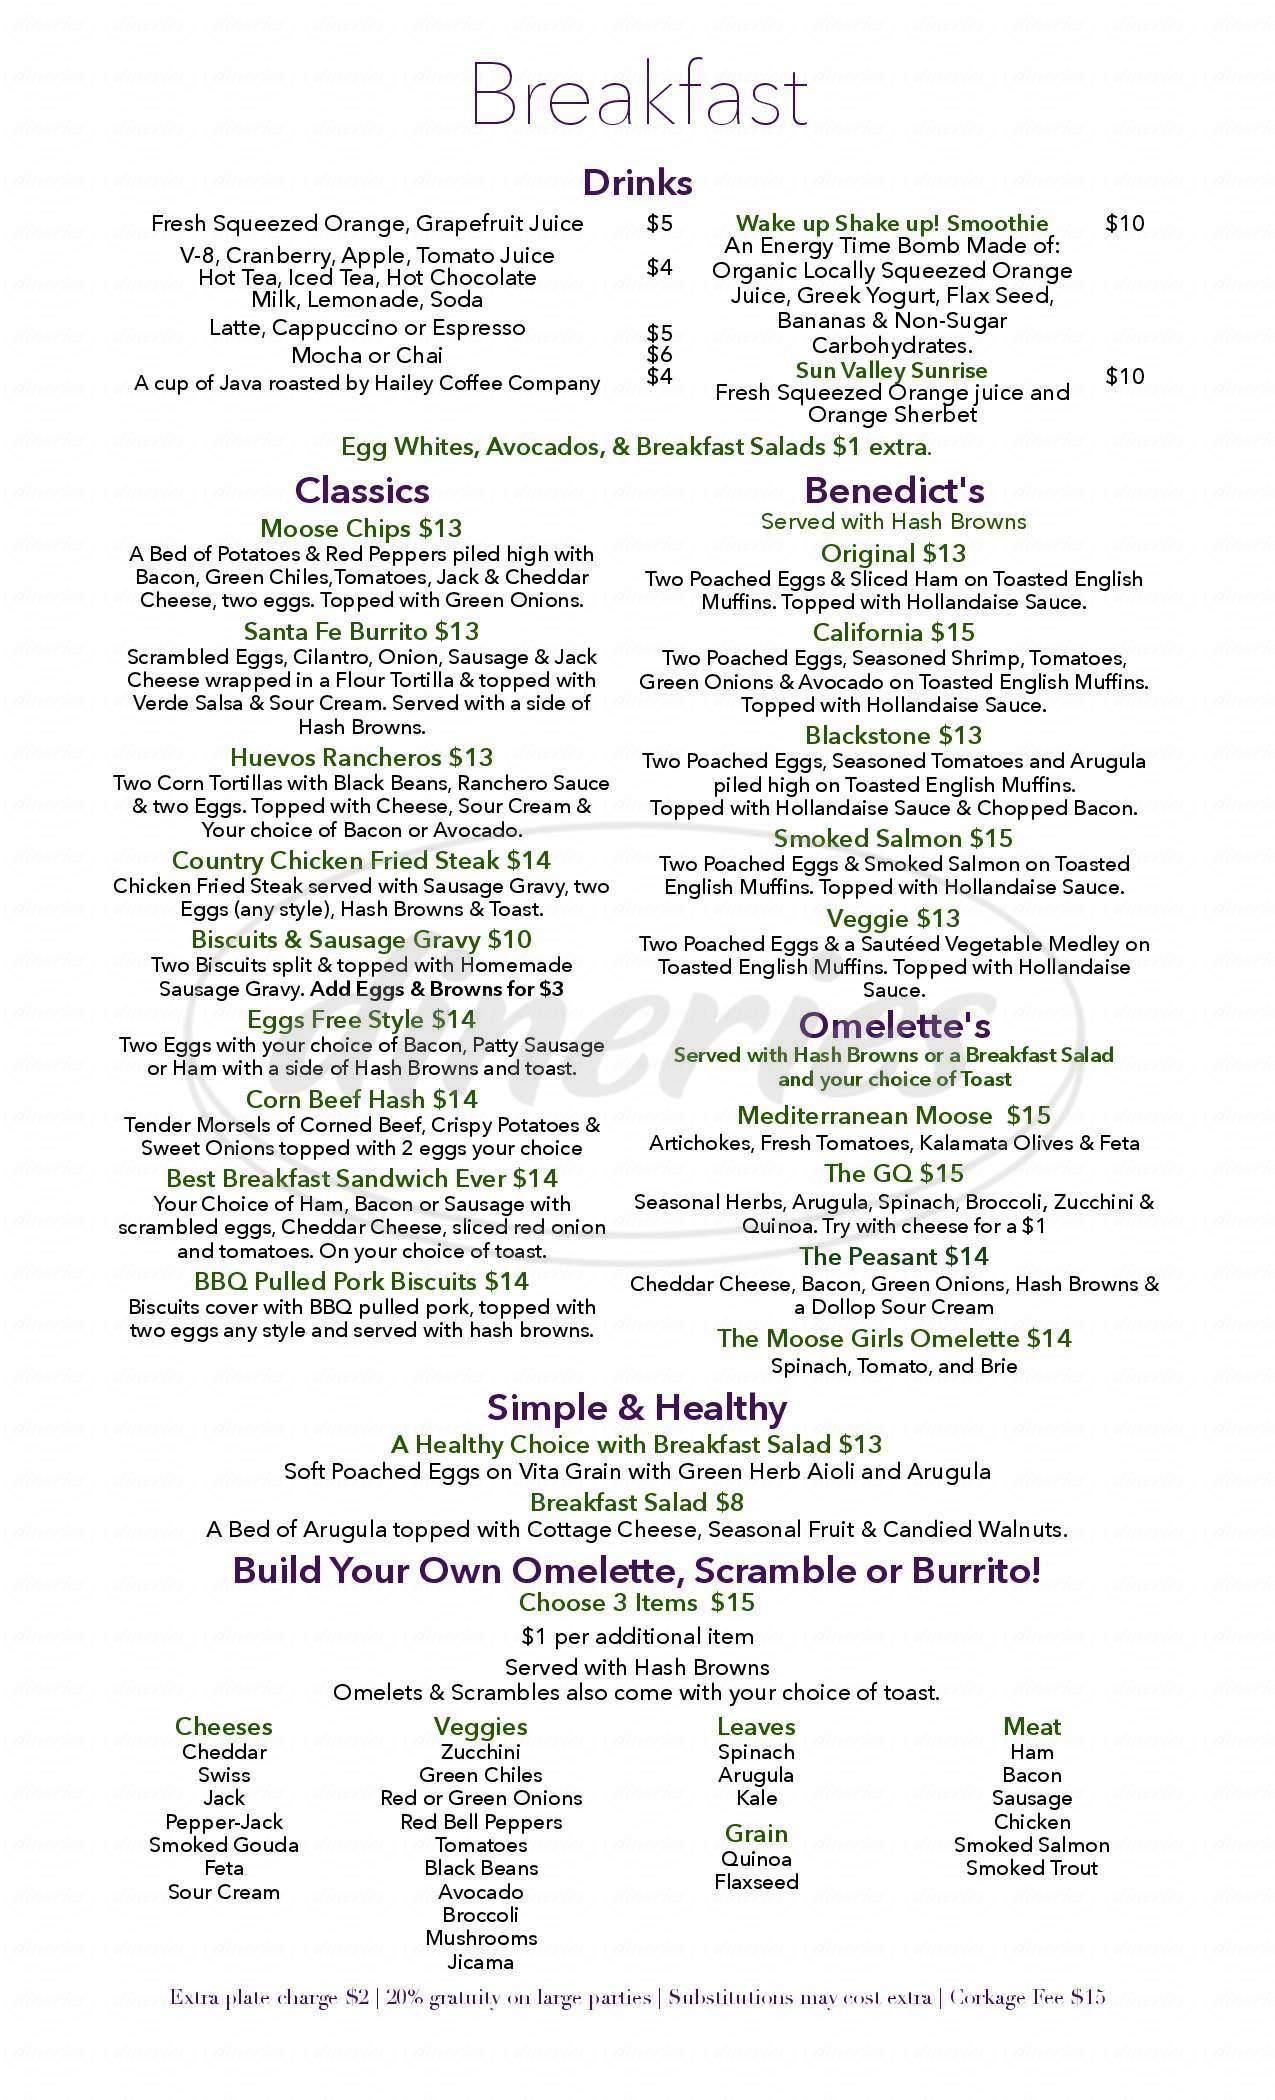 menu for The Moose Girls Cafe